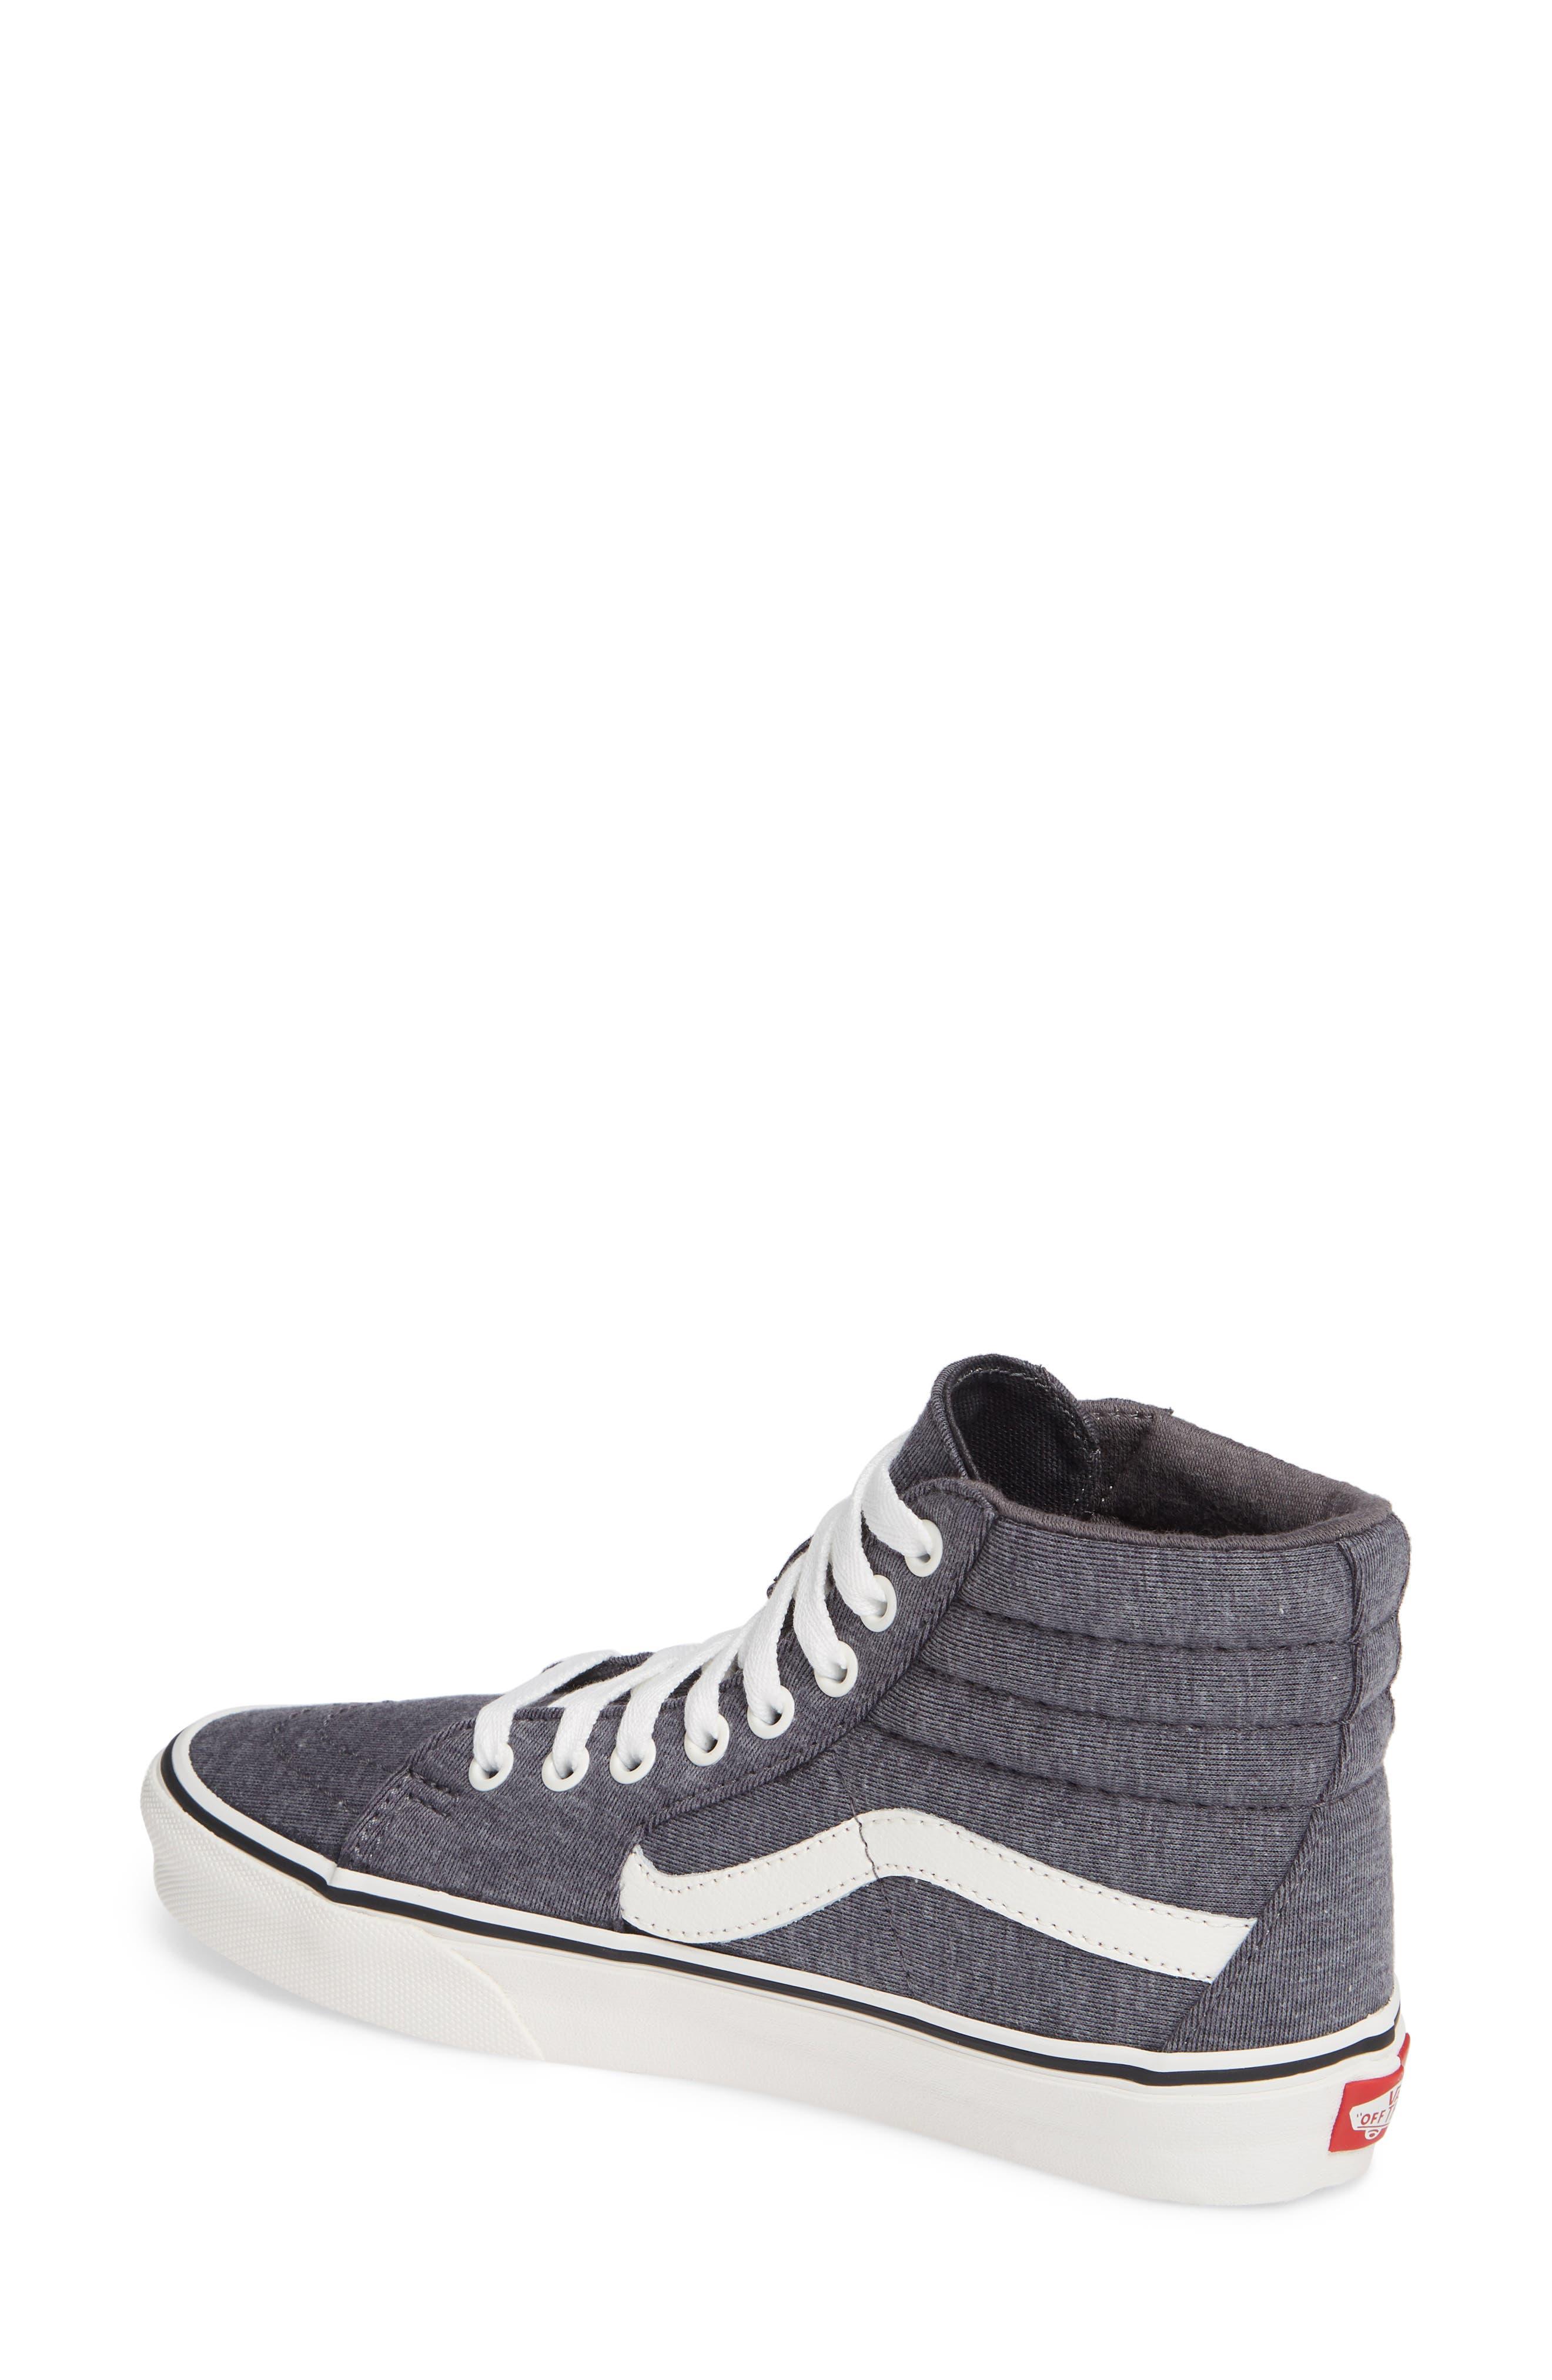 'Sk8-Hi' Sneaker,                             Alternate thumbnail 2, color,                             GREY/ SNOW WHITE